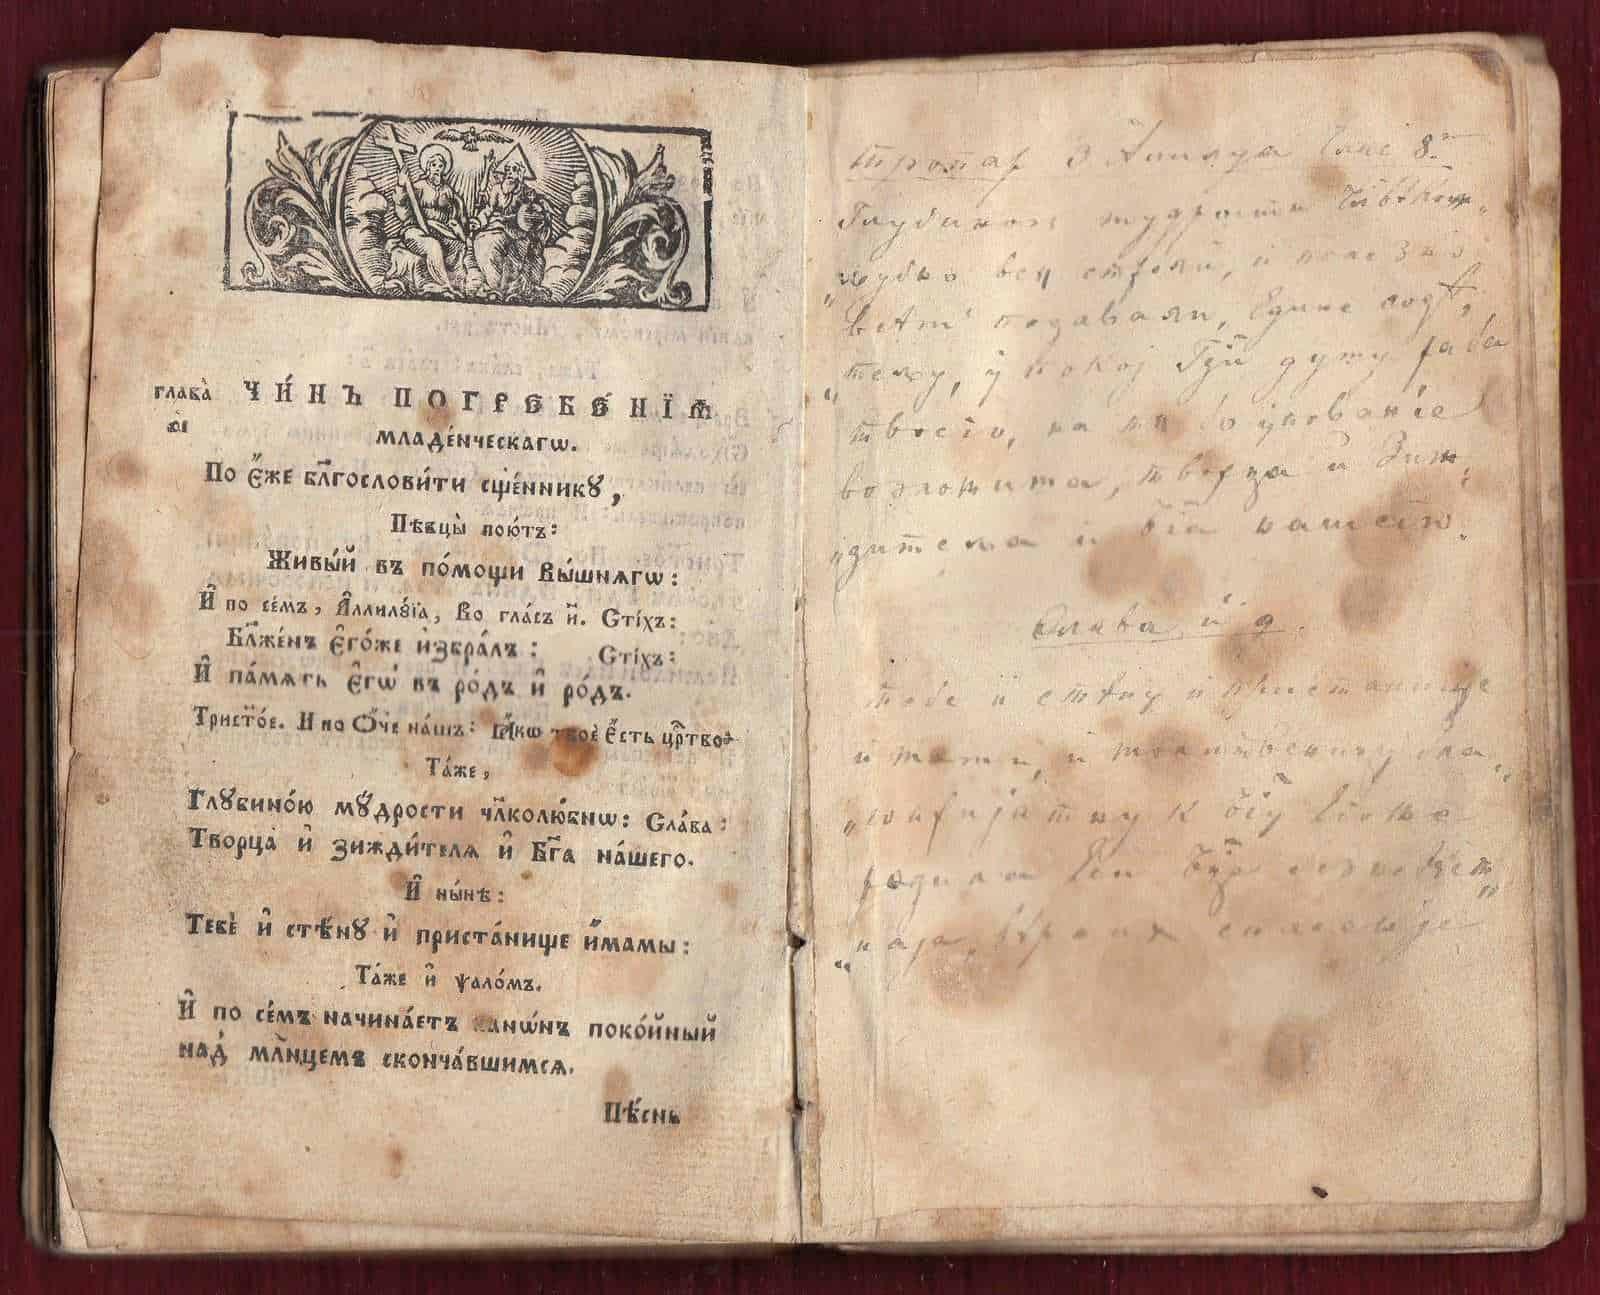 19c-Posledovanie-Acolouthia-e-Old-Slavonic-Inscribed-Manuscript-401146479031-10